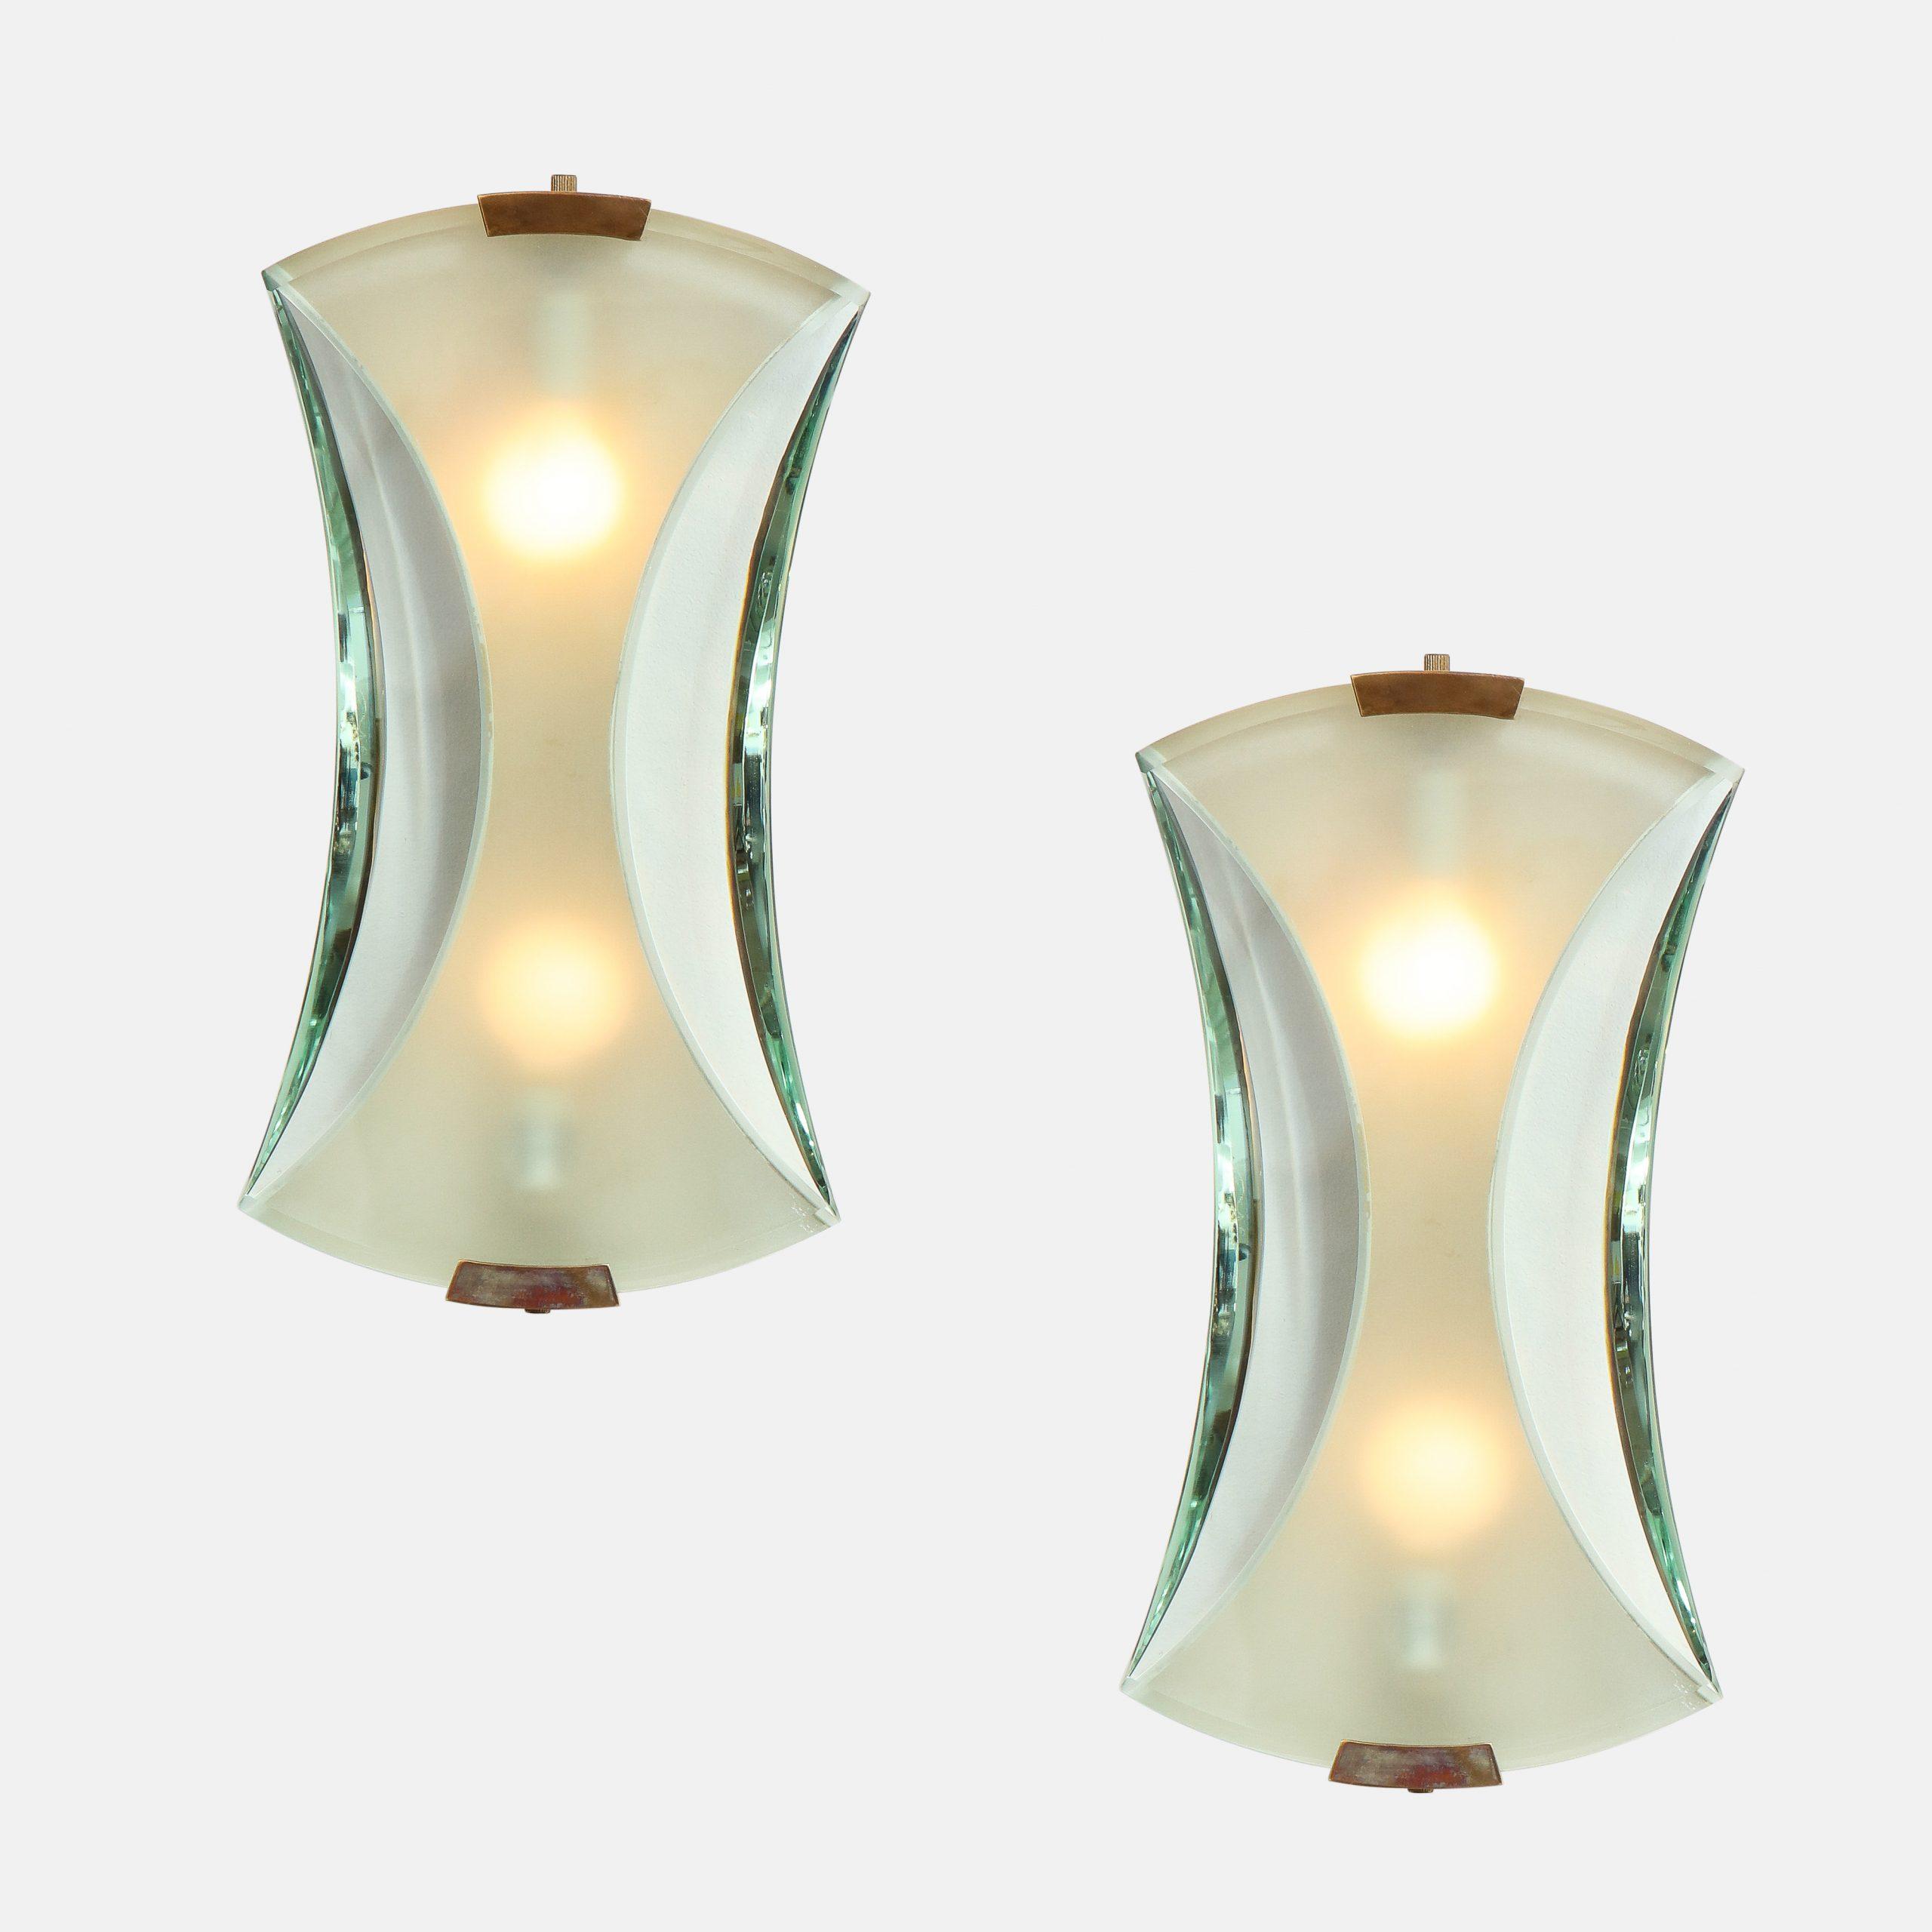 Pair of Sconces Model 2225 by Max Ingrand for Fontana Arte | soyun k.